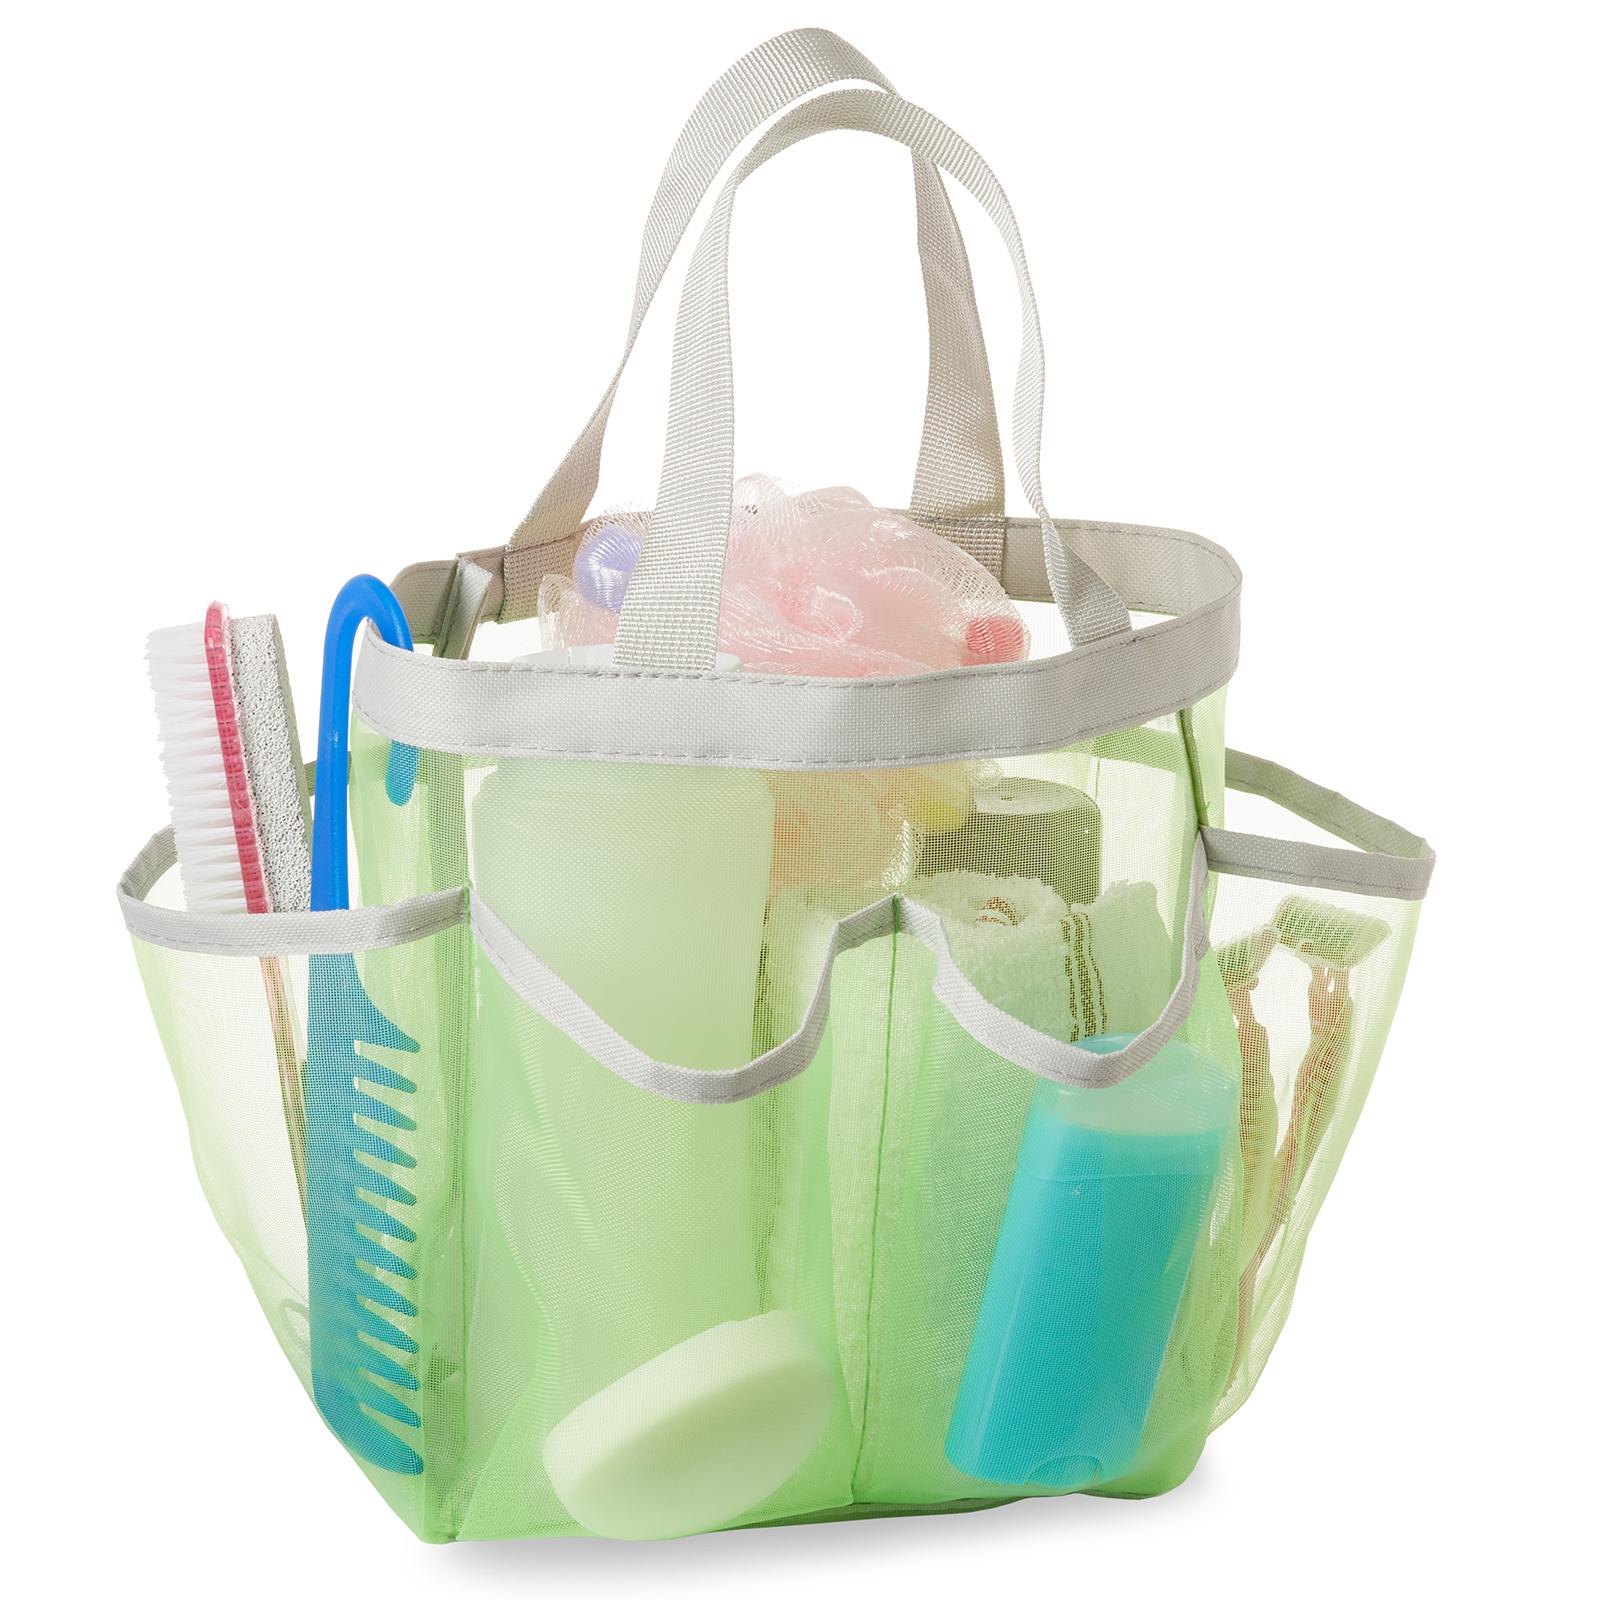 Portable Mesh Shower Caddy Tote Bathroom Hanging Toiletry Organizer Storage Bag